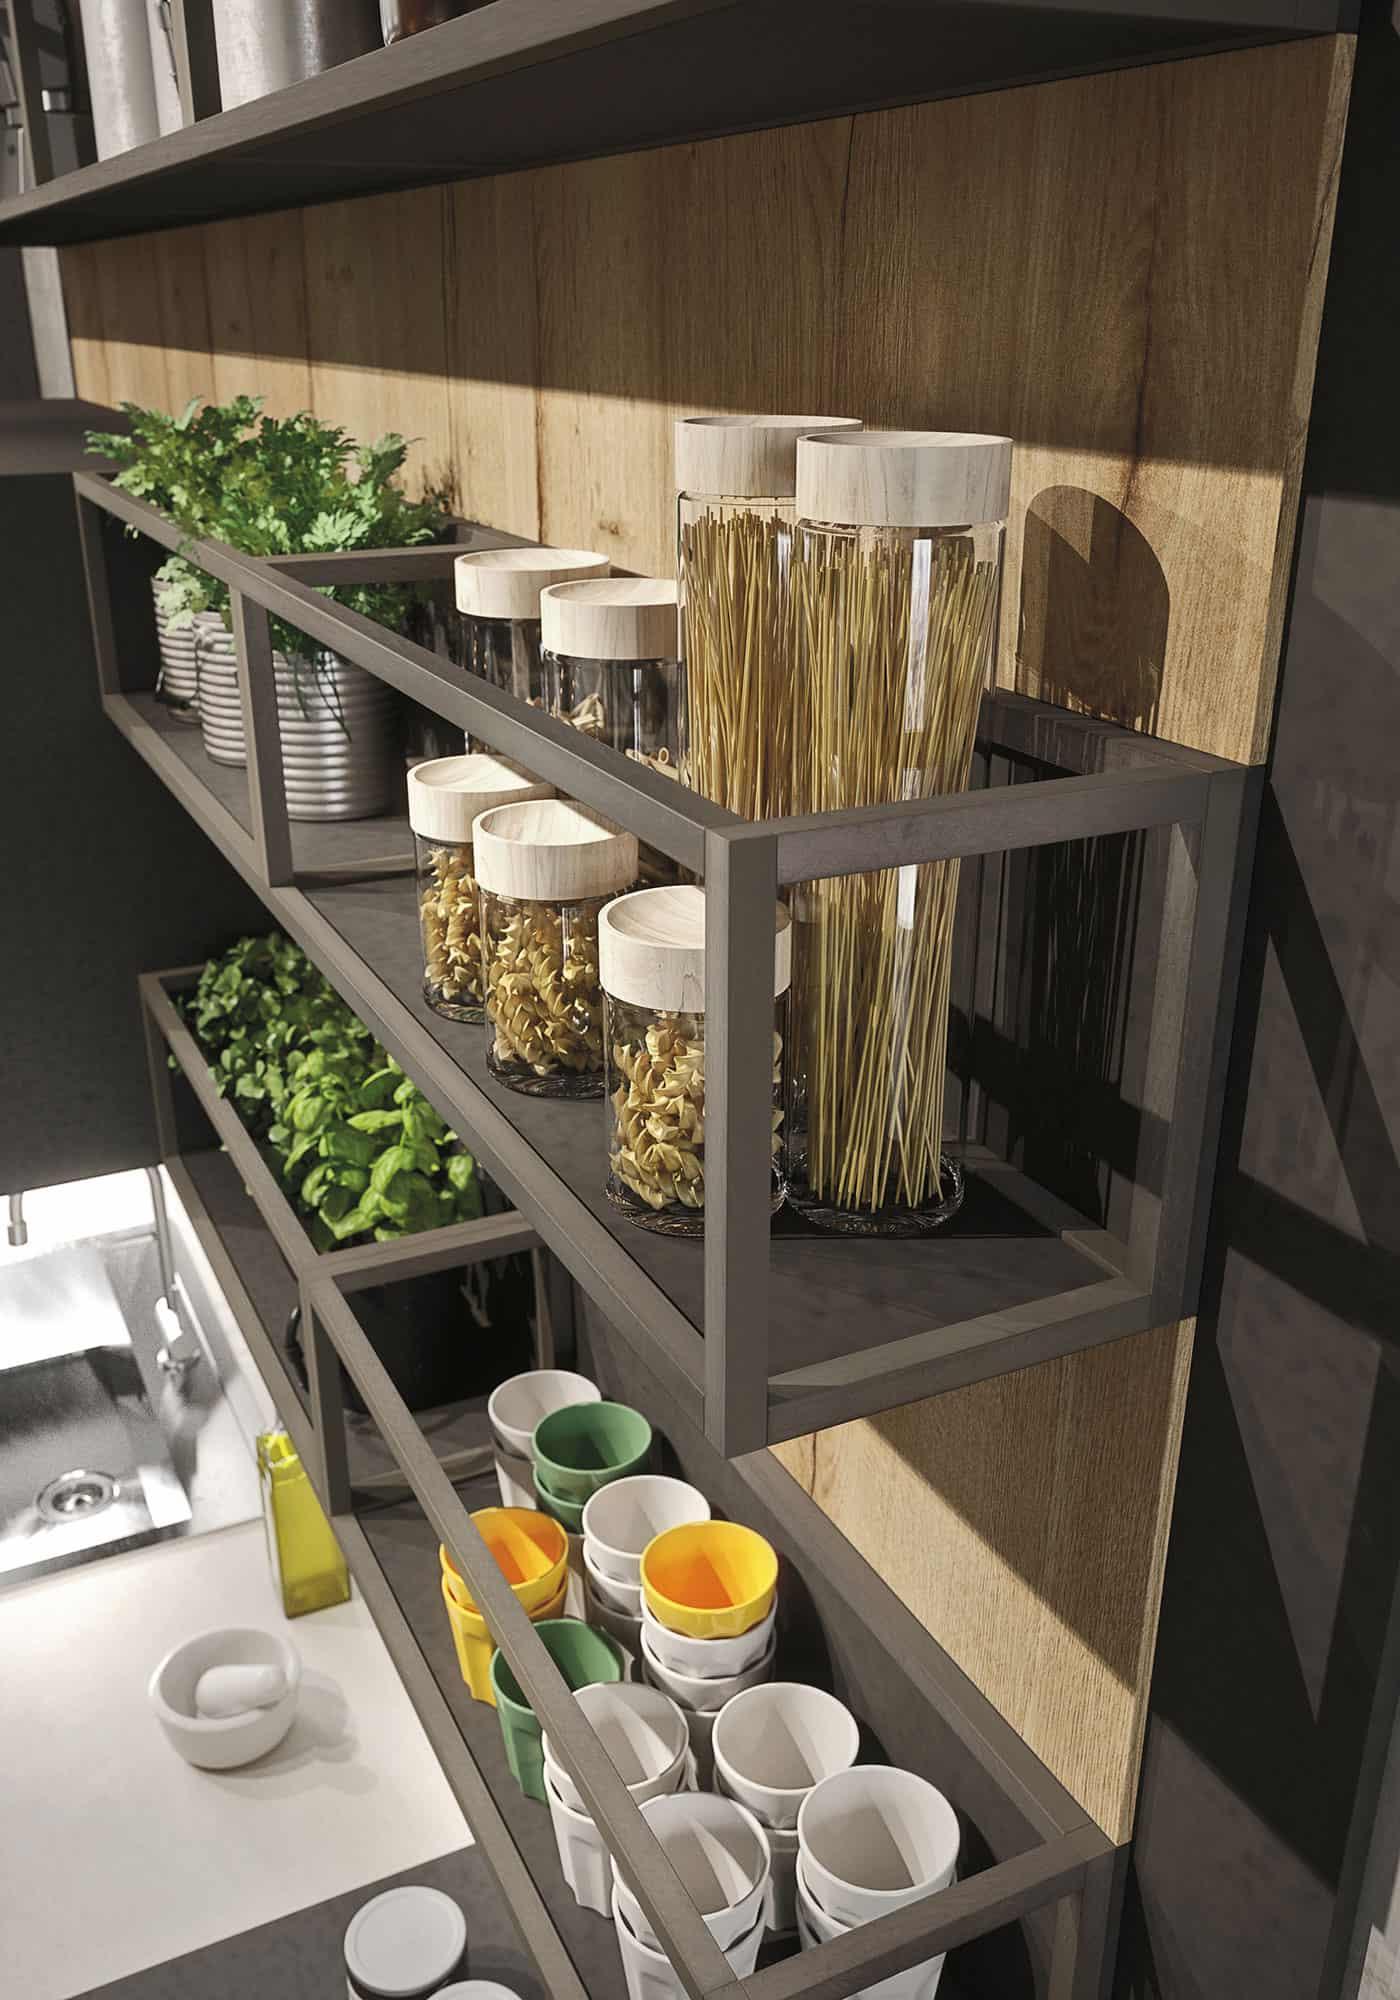 Kitchen Design For Lofts 3 Urban Ideas From Snaidero